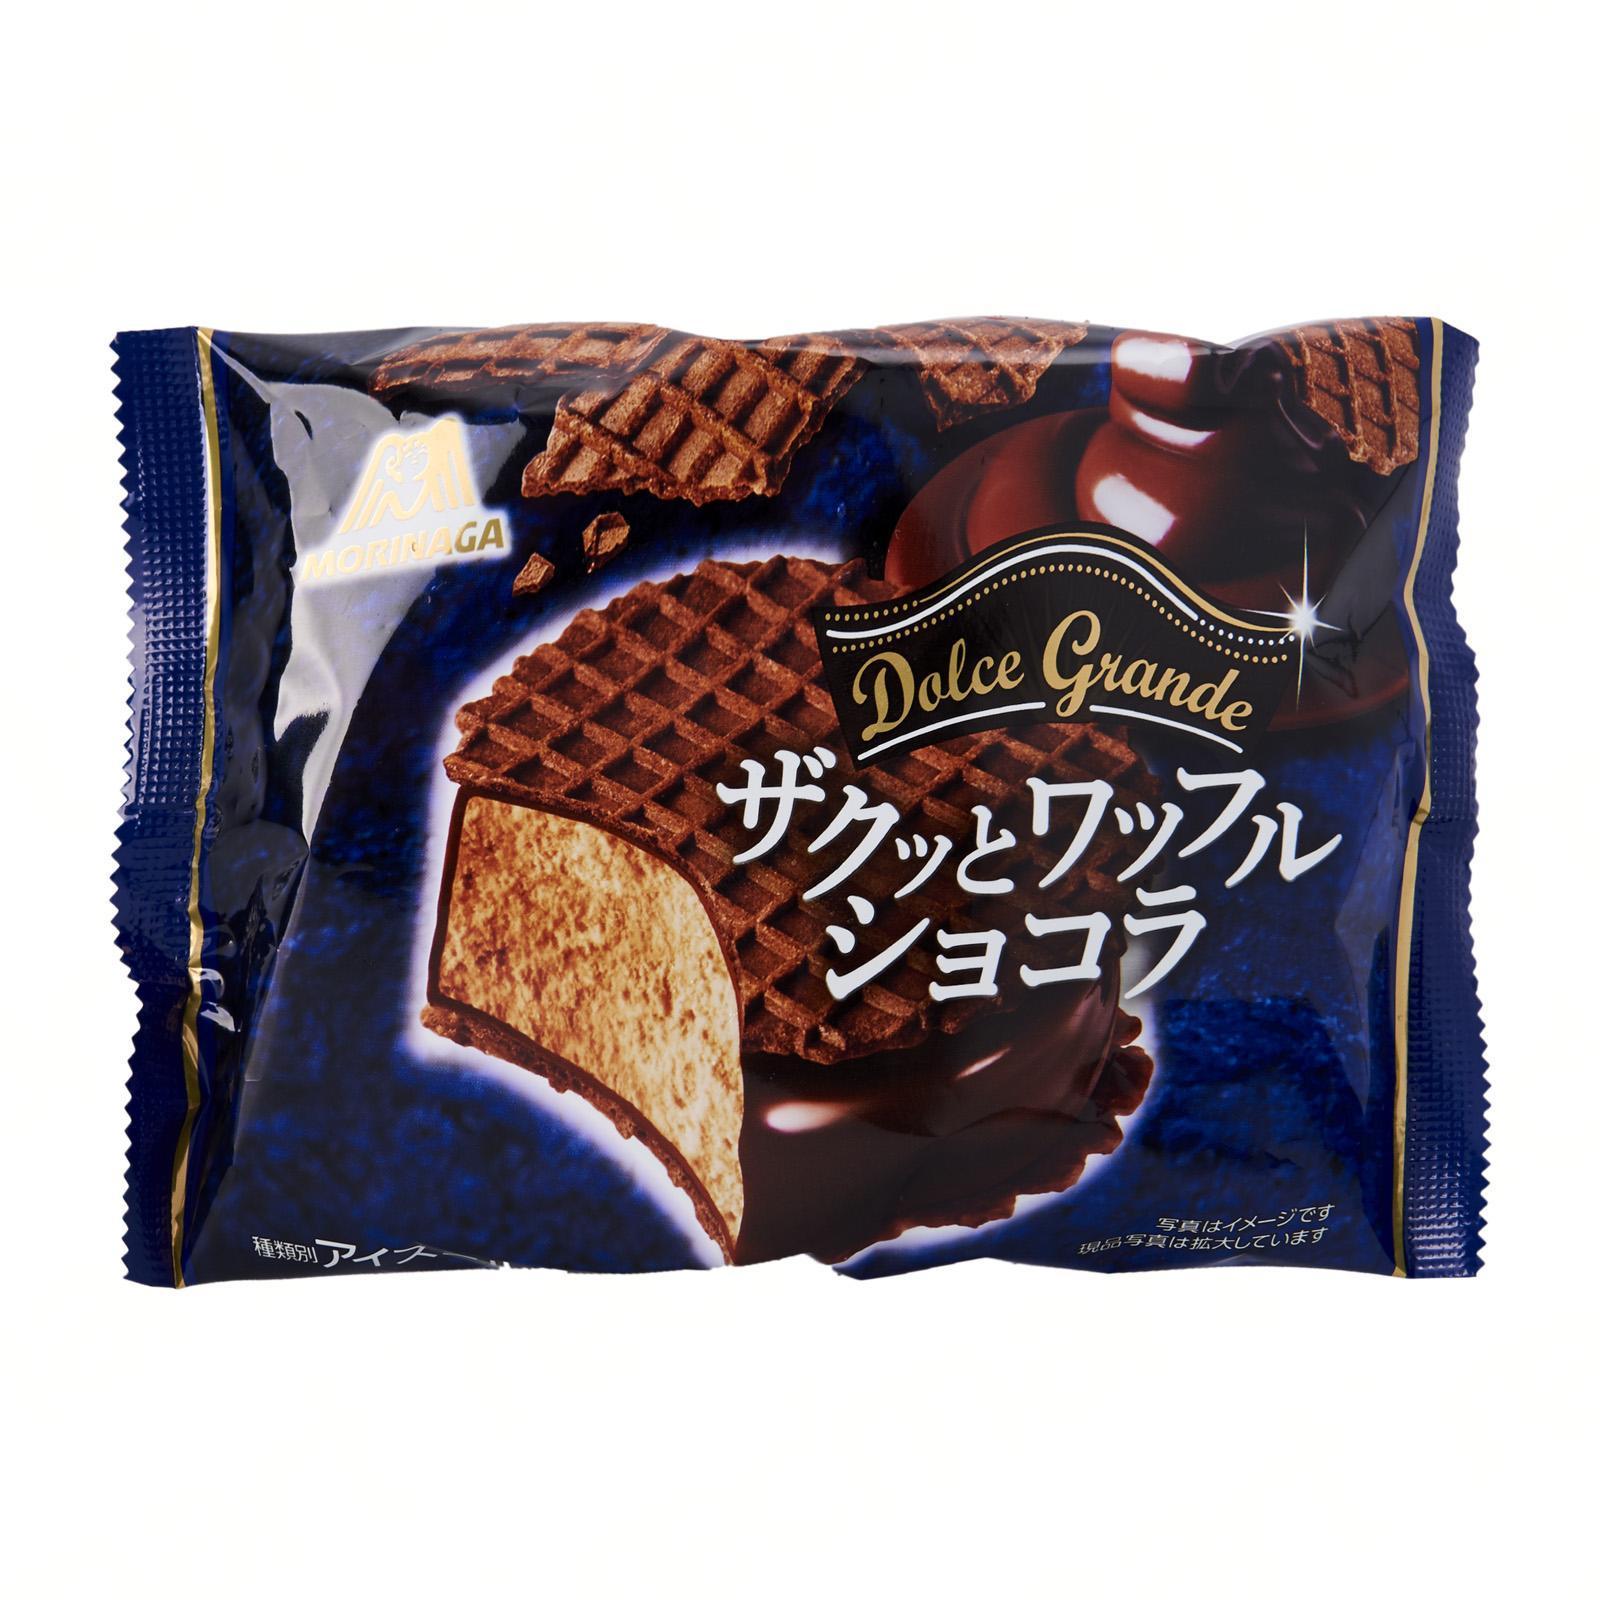 Morinaga Chocolate Waffle Ice Cream Sandwich - Frozen - Jetro Special